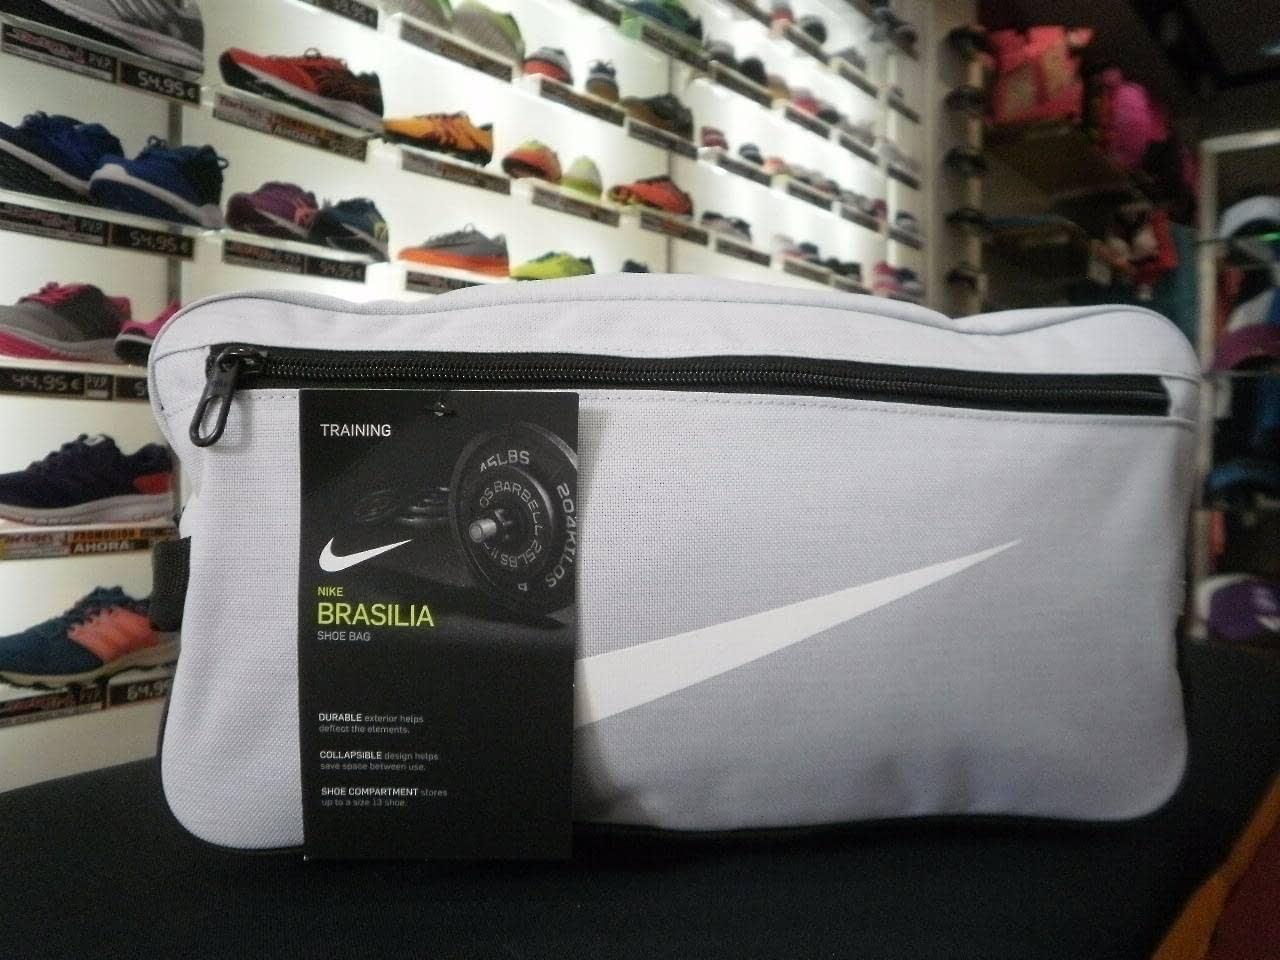 Catálogo  Nike Brasilia Shoes Bag. Haz click para ampliar la imagen 967544716cb94